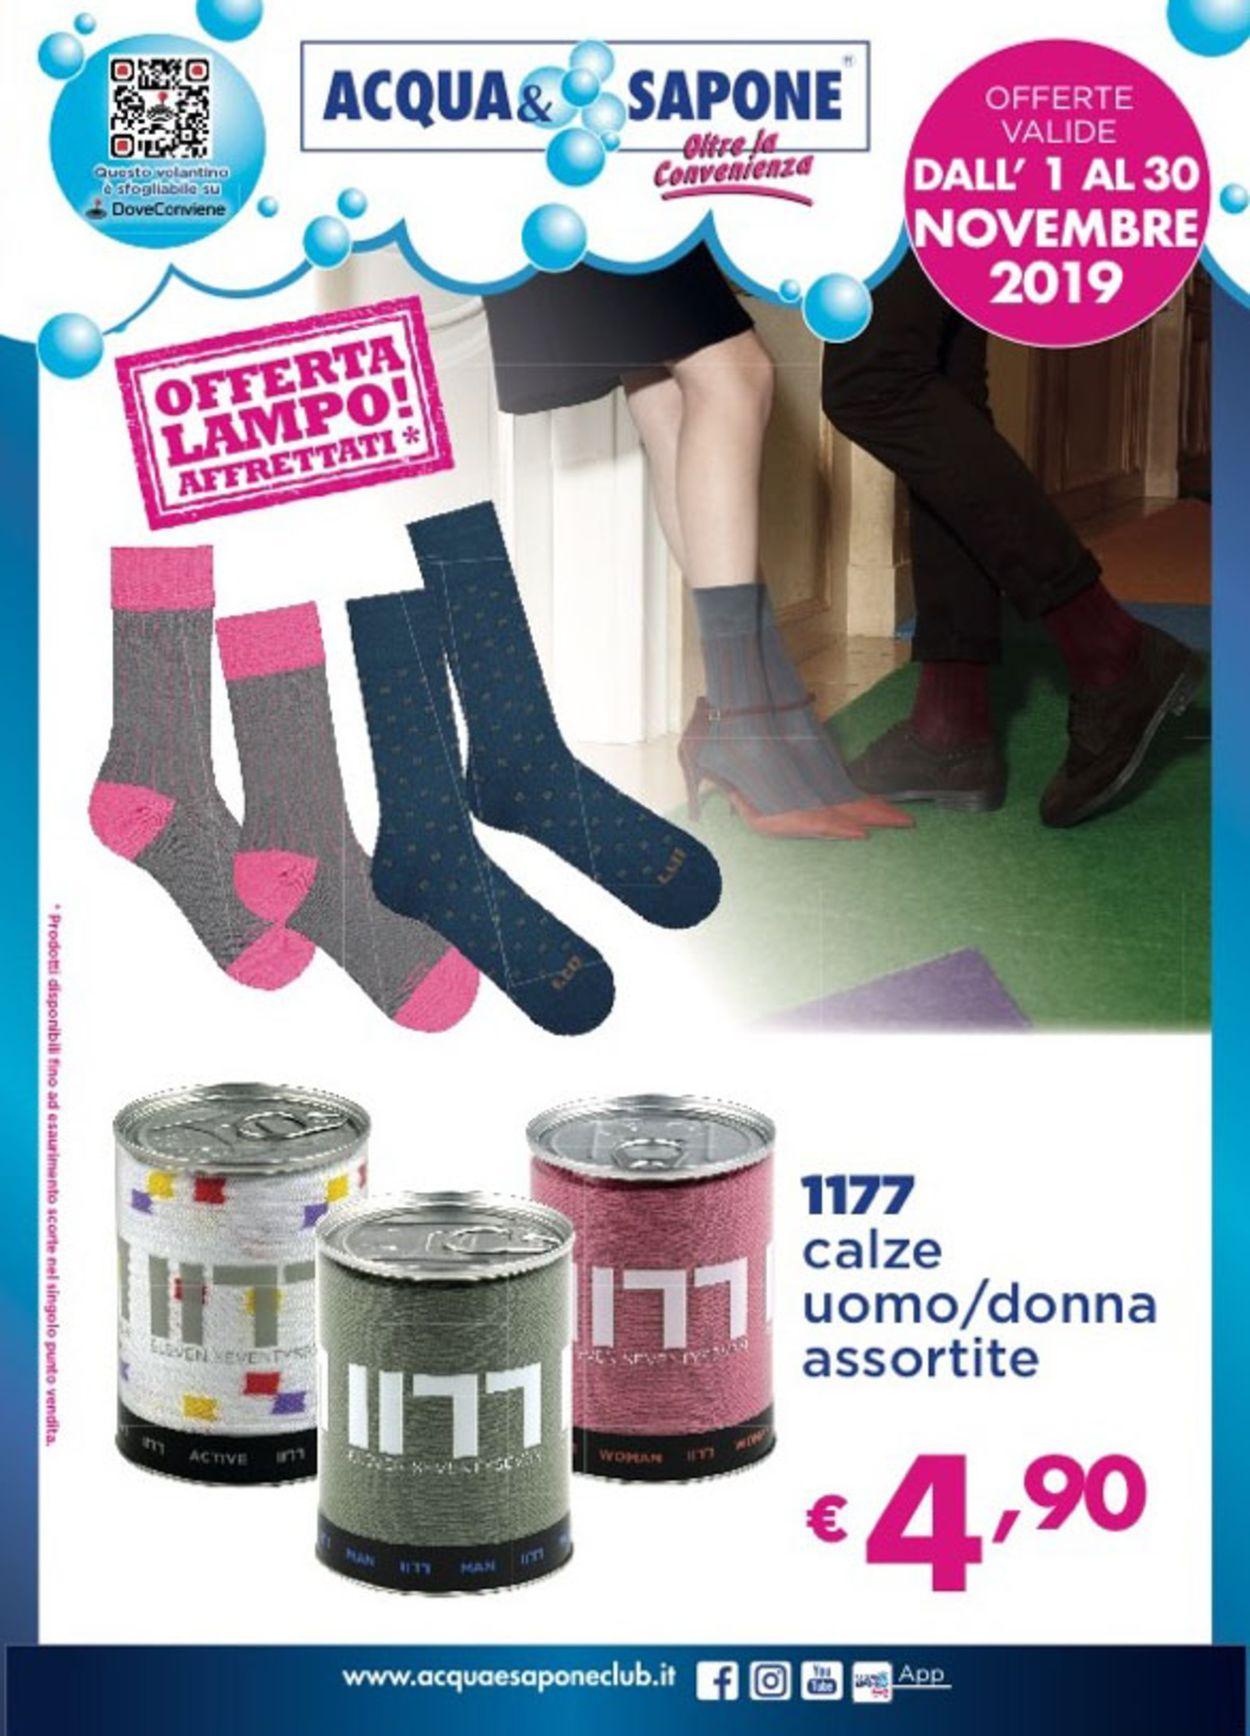 Volantino Acqua & Sapone - Offerte 01/11-30/11/2019